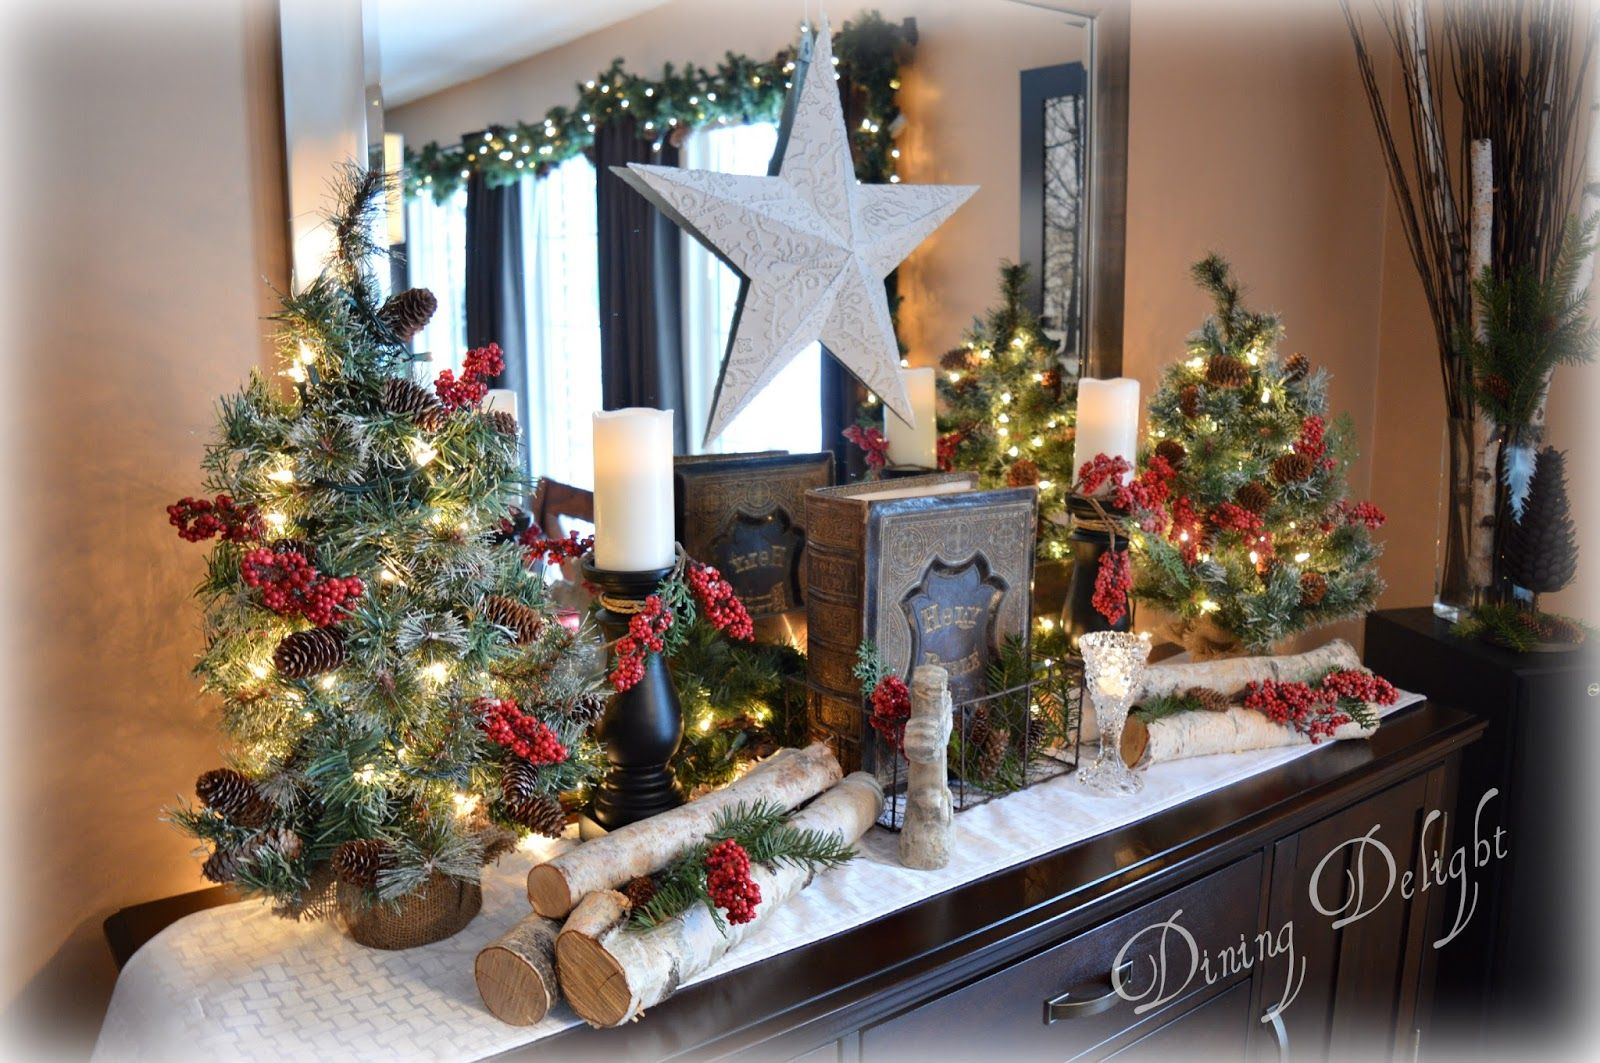 Rustic Christmas Sideboard Christmas Rustic christmas, Christmas, Christmas decorations